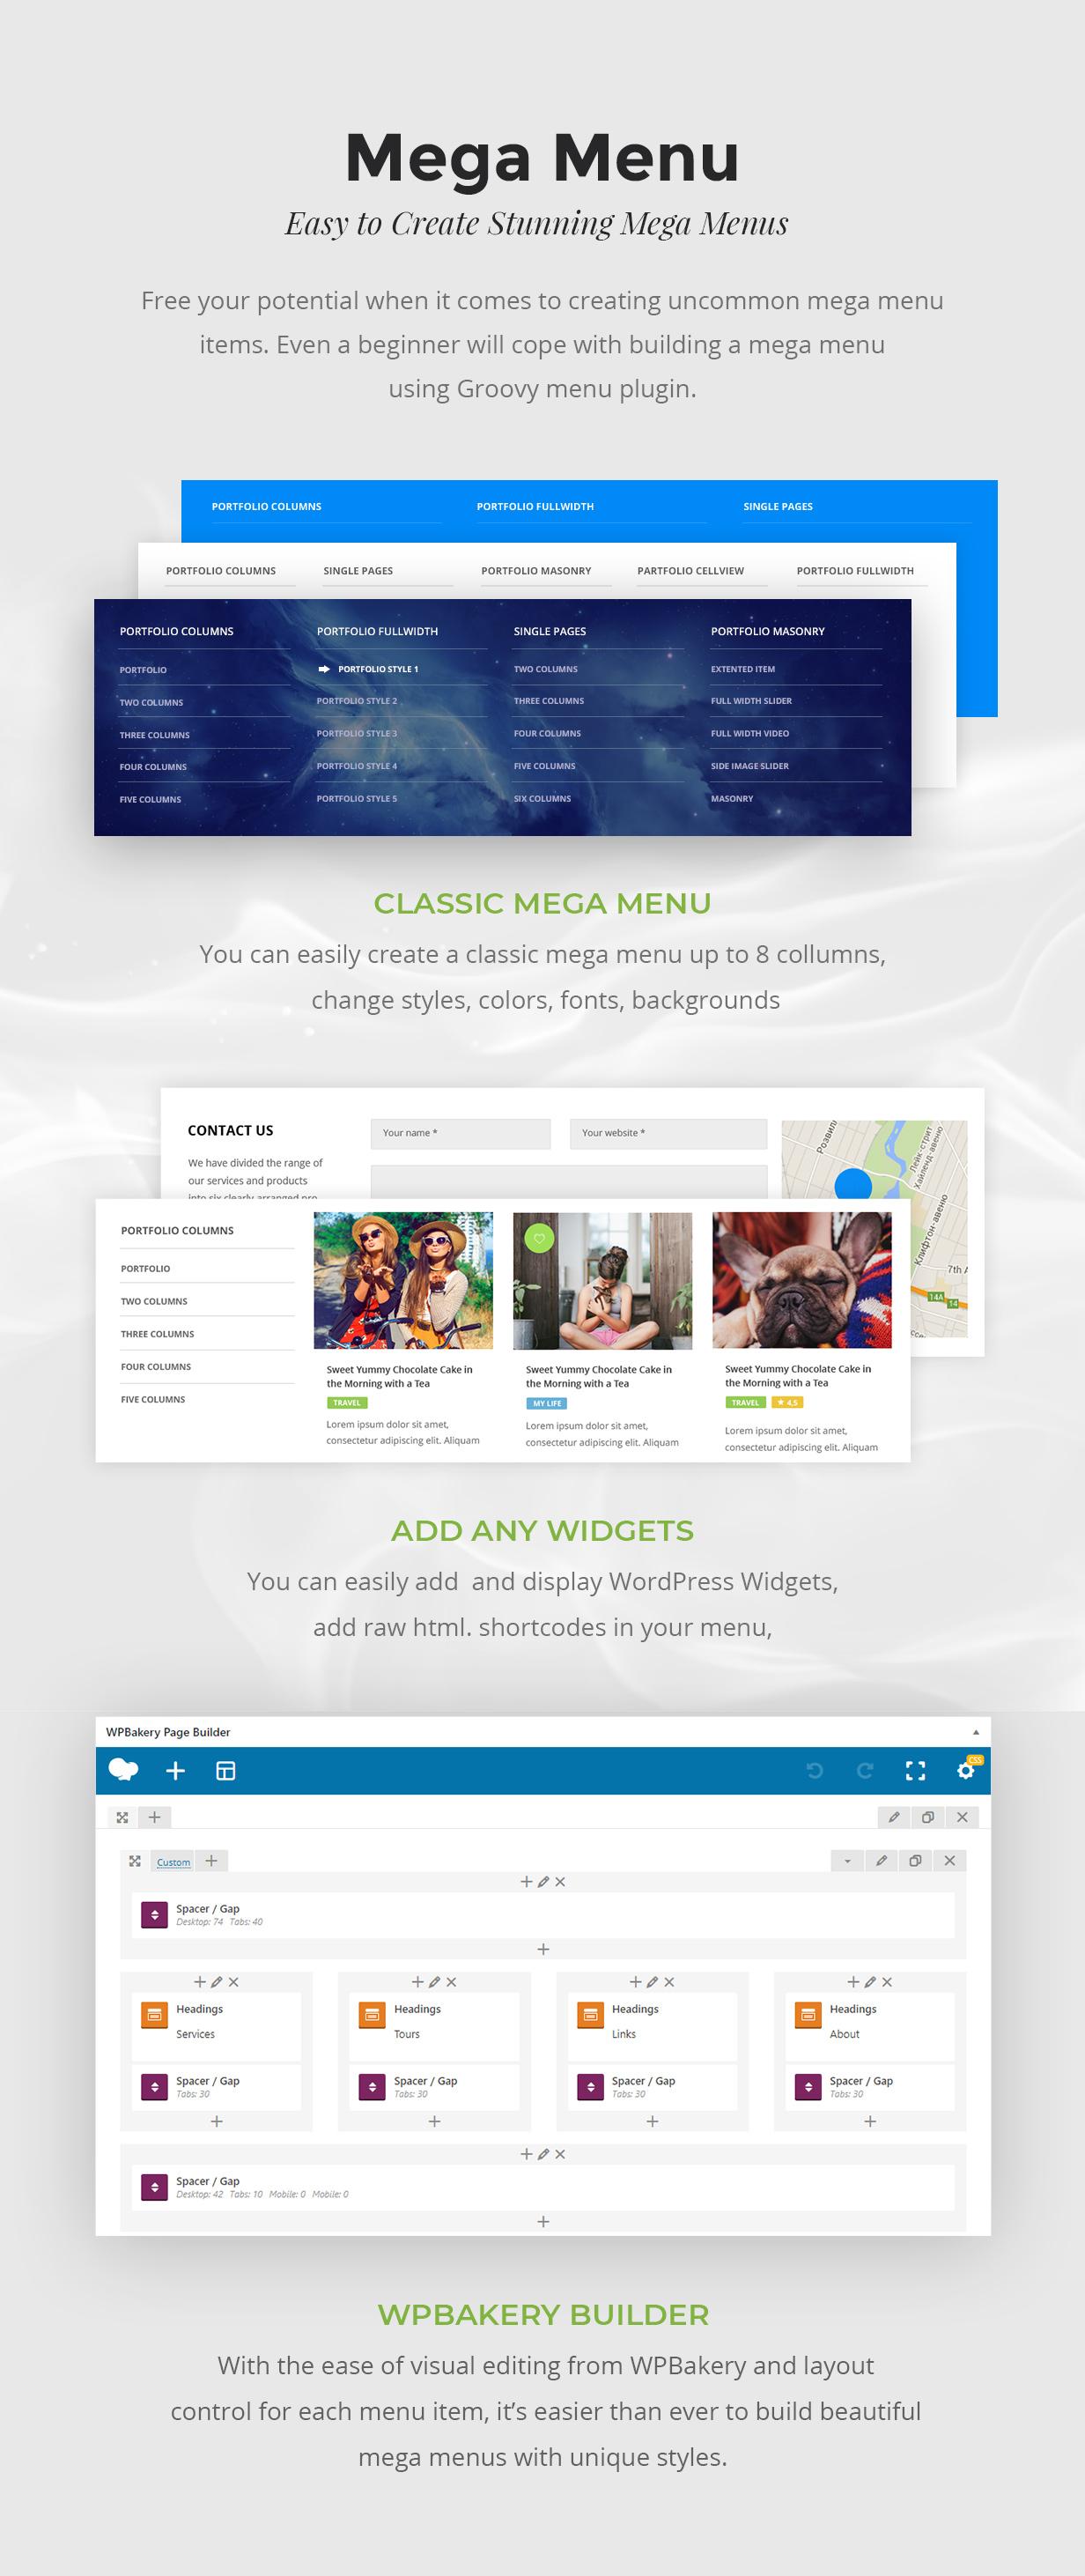 Mega Menu Wordpress Widgets, WPbakery widgets